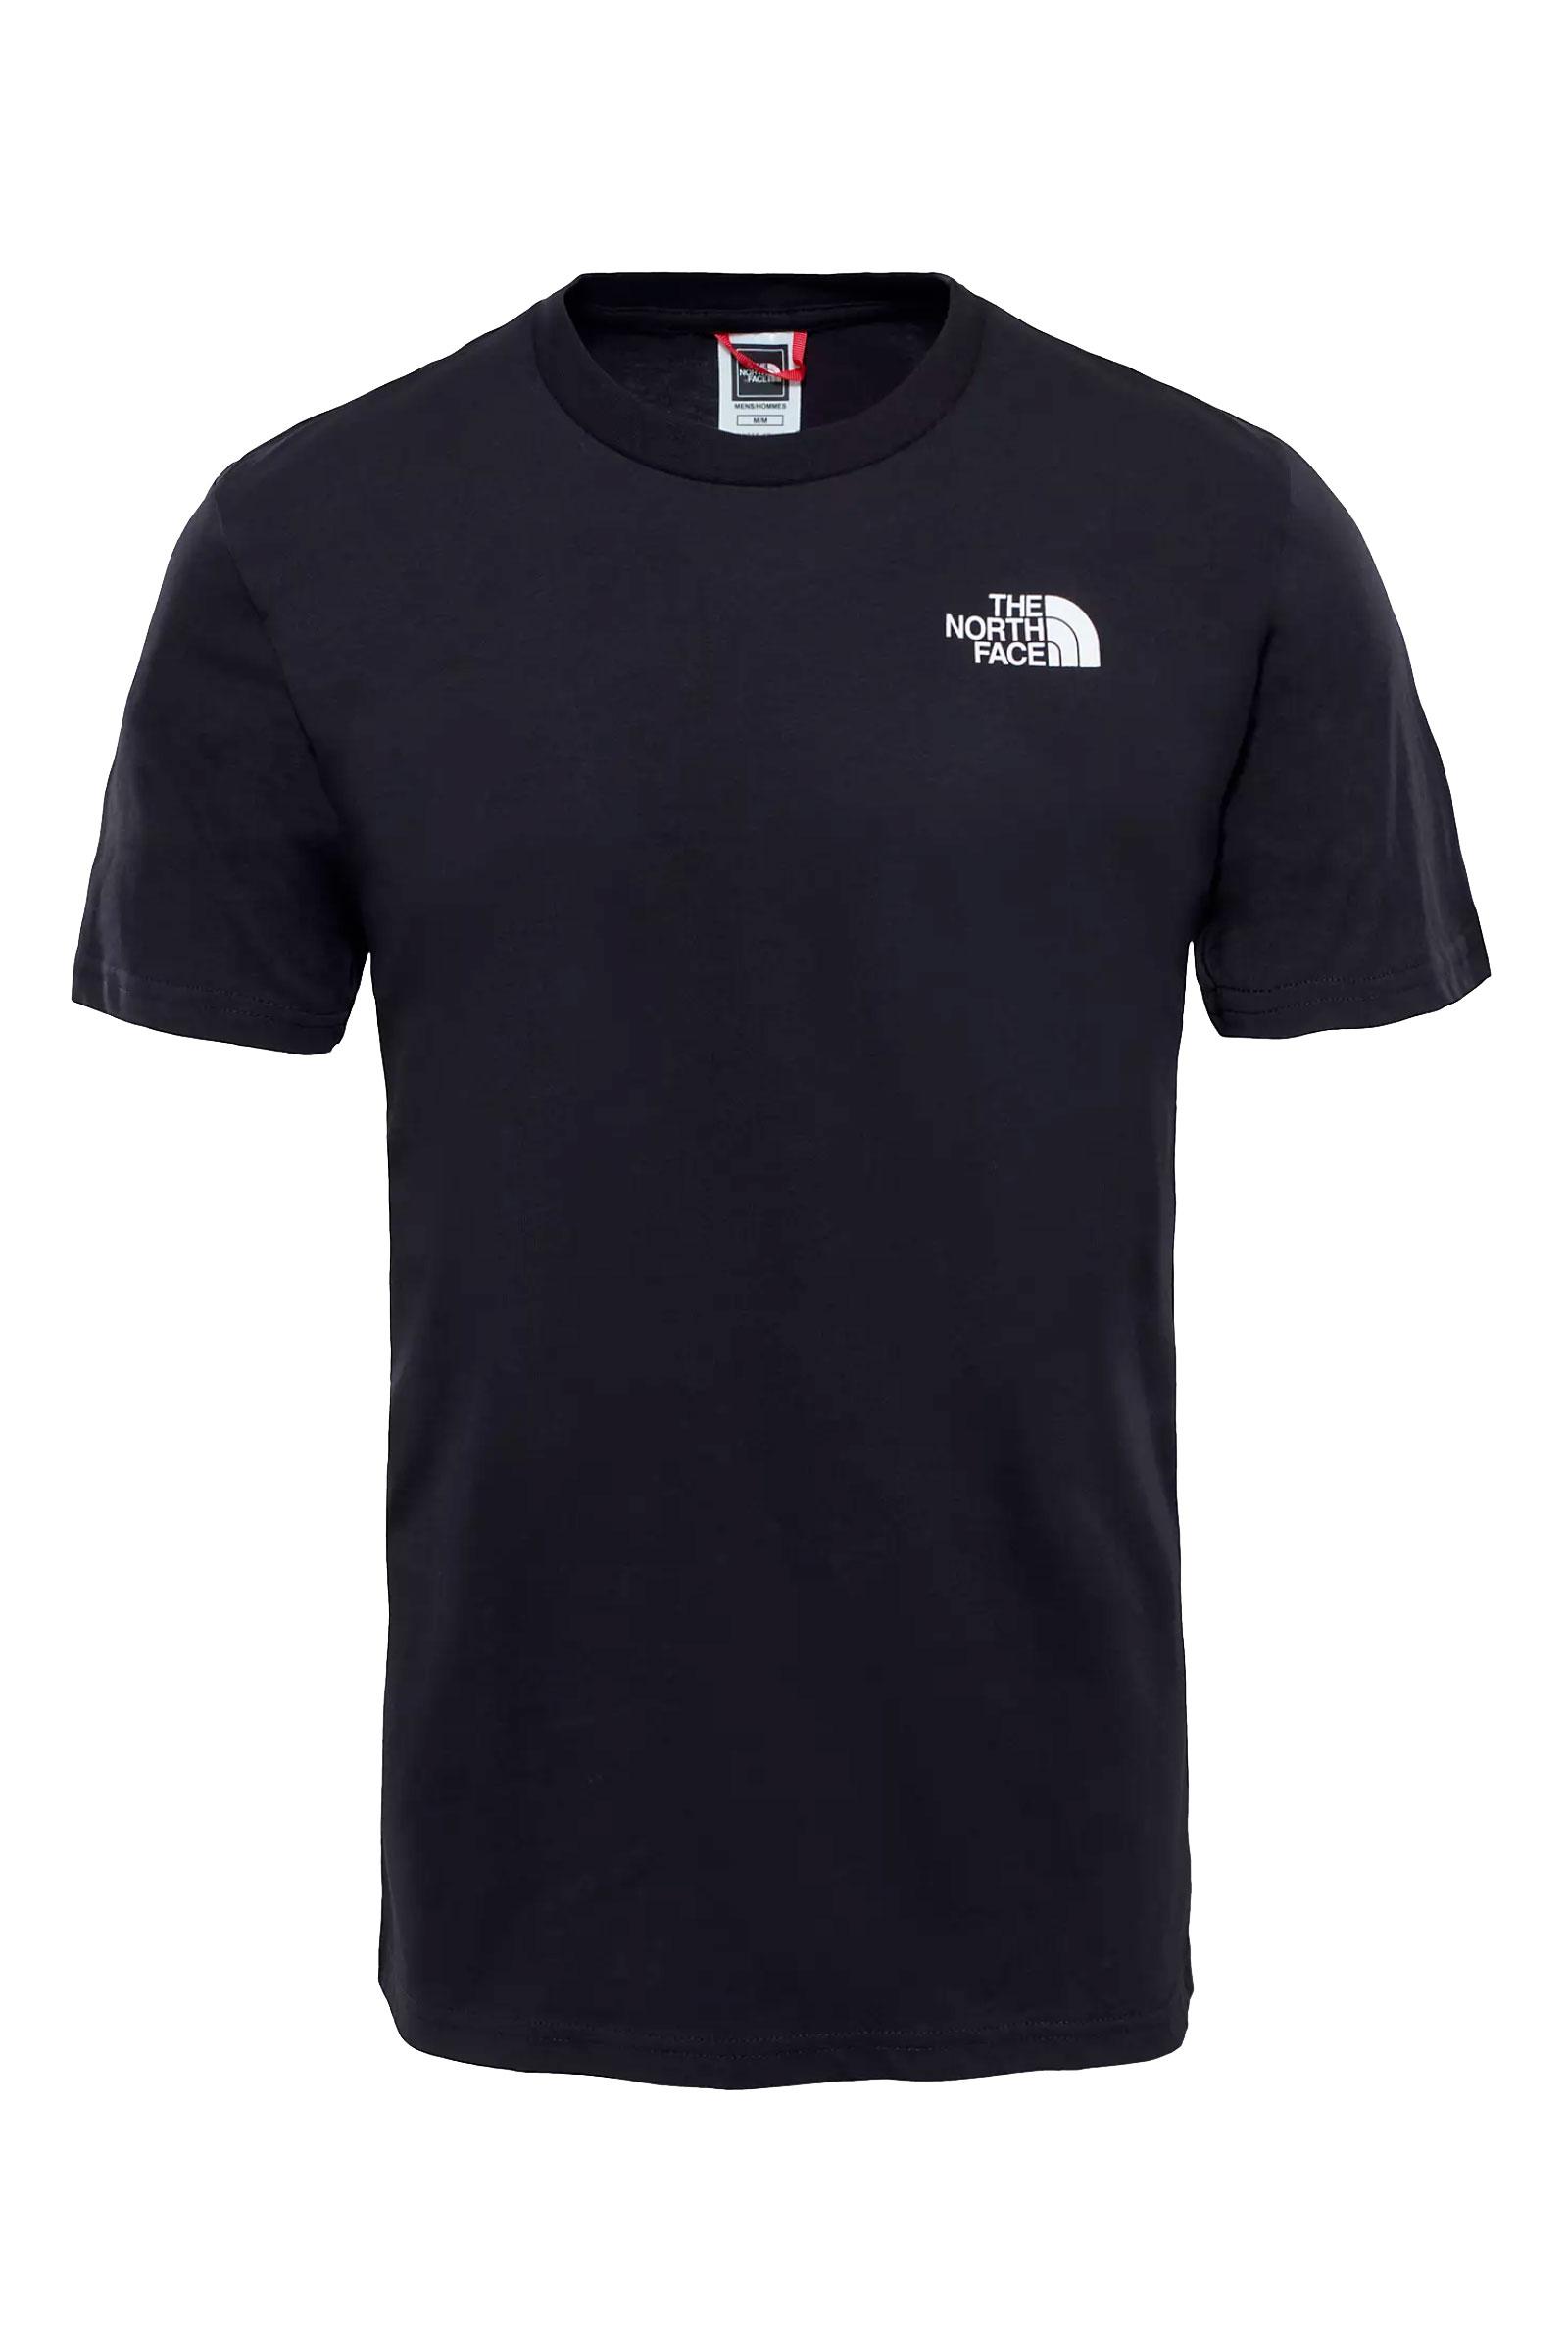 THE NORTH FACE T-Shirt Uomo THE NORTH FACE | T-Shirt | NF0A2TX5JK31